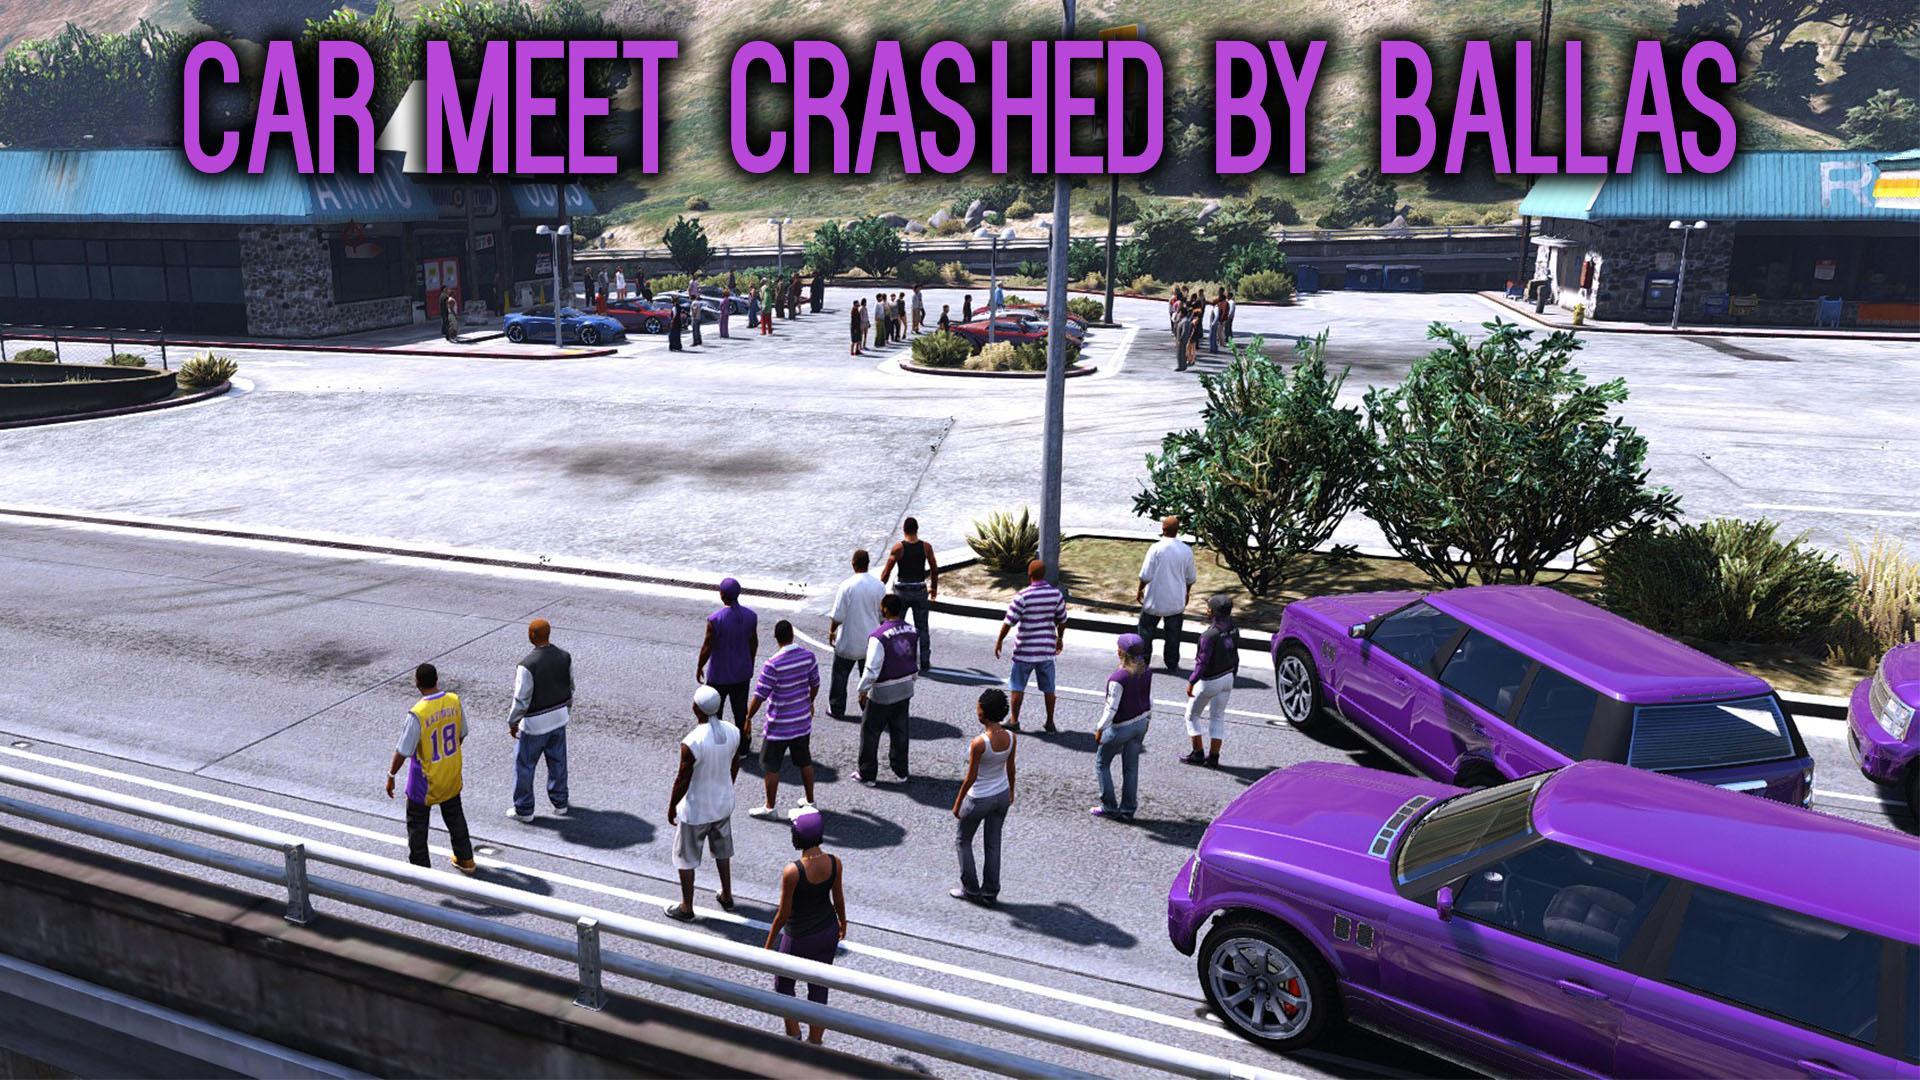 Car Meet Crashed by Ballas [Menyoo] - GTA5-Mods.com